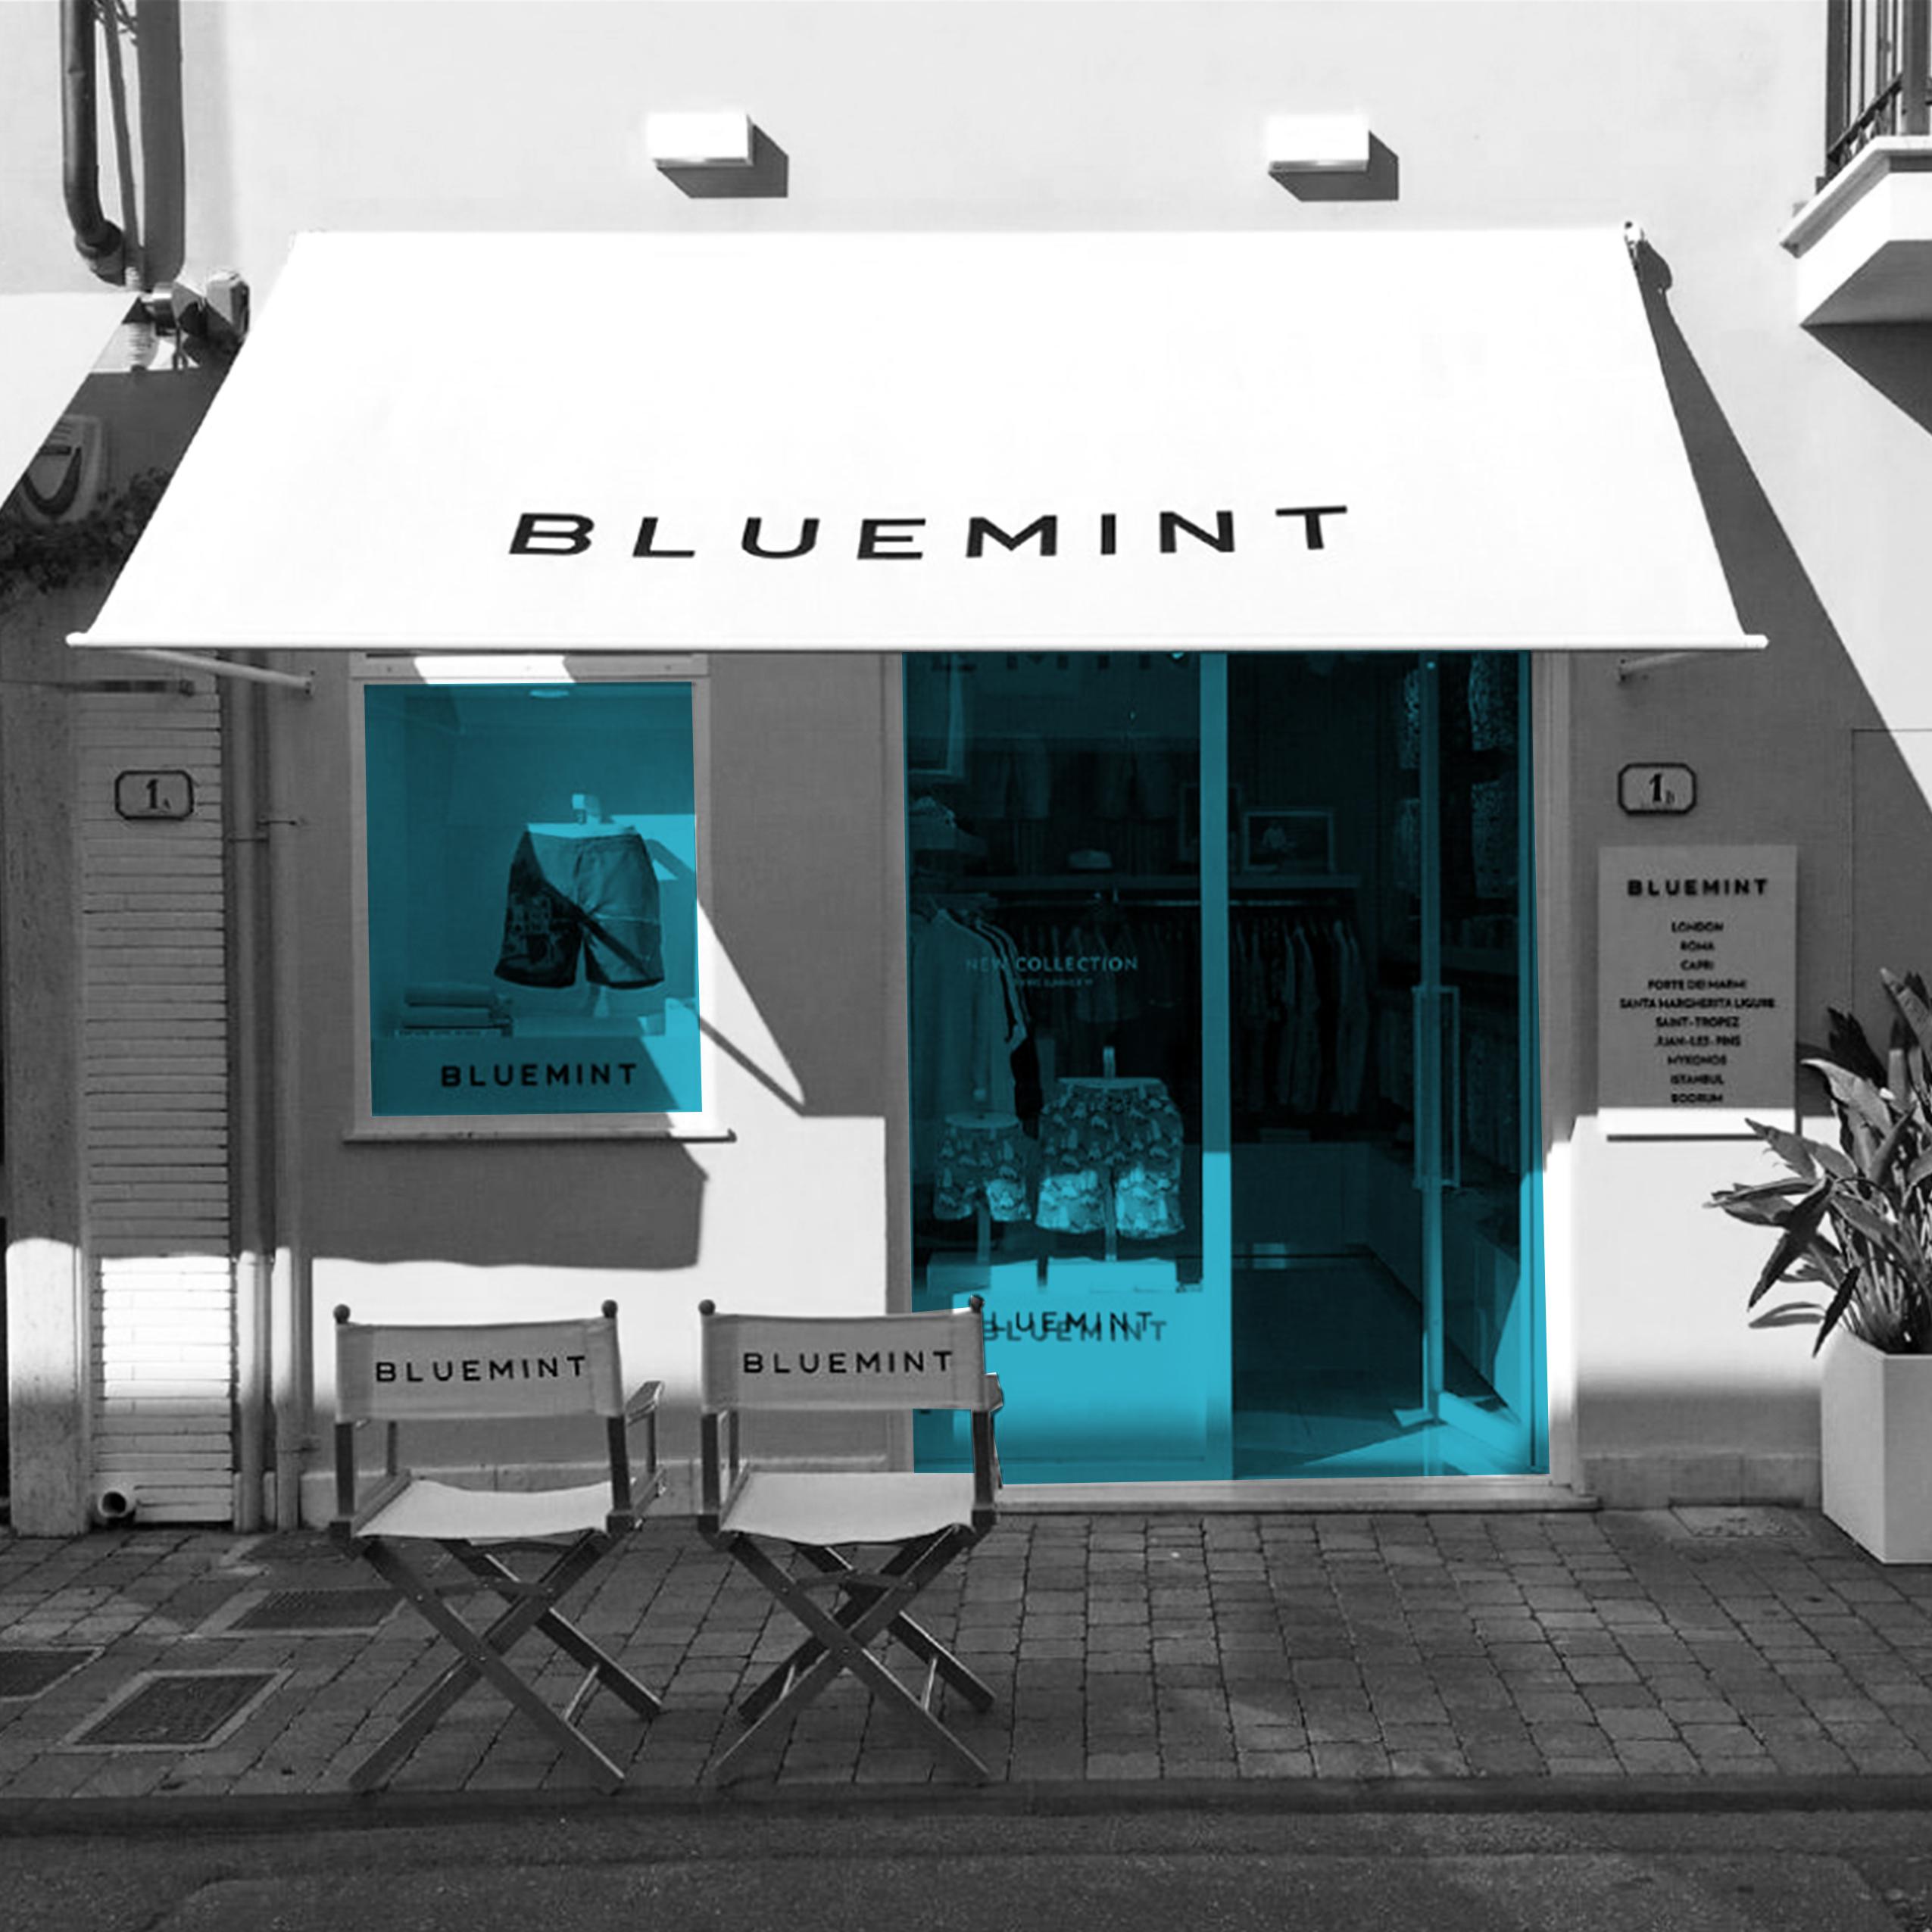 Bluemint